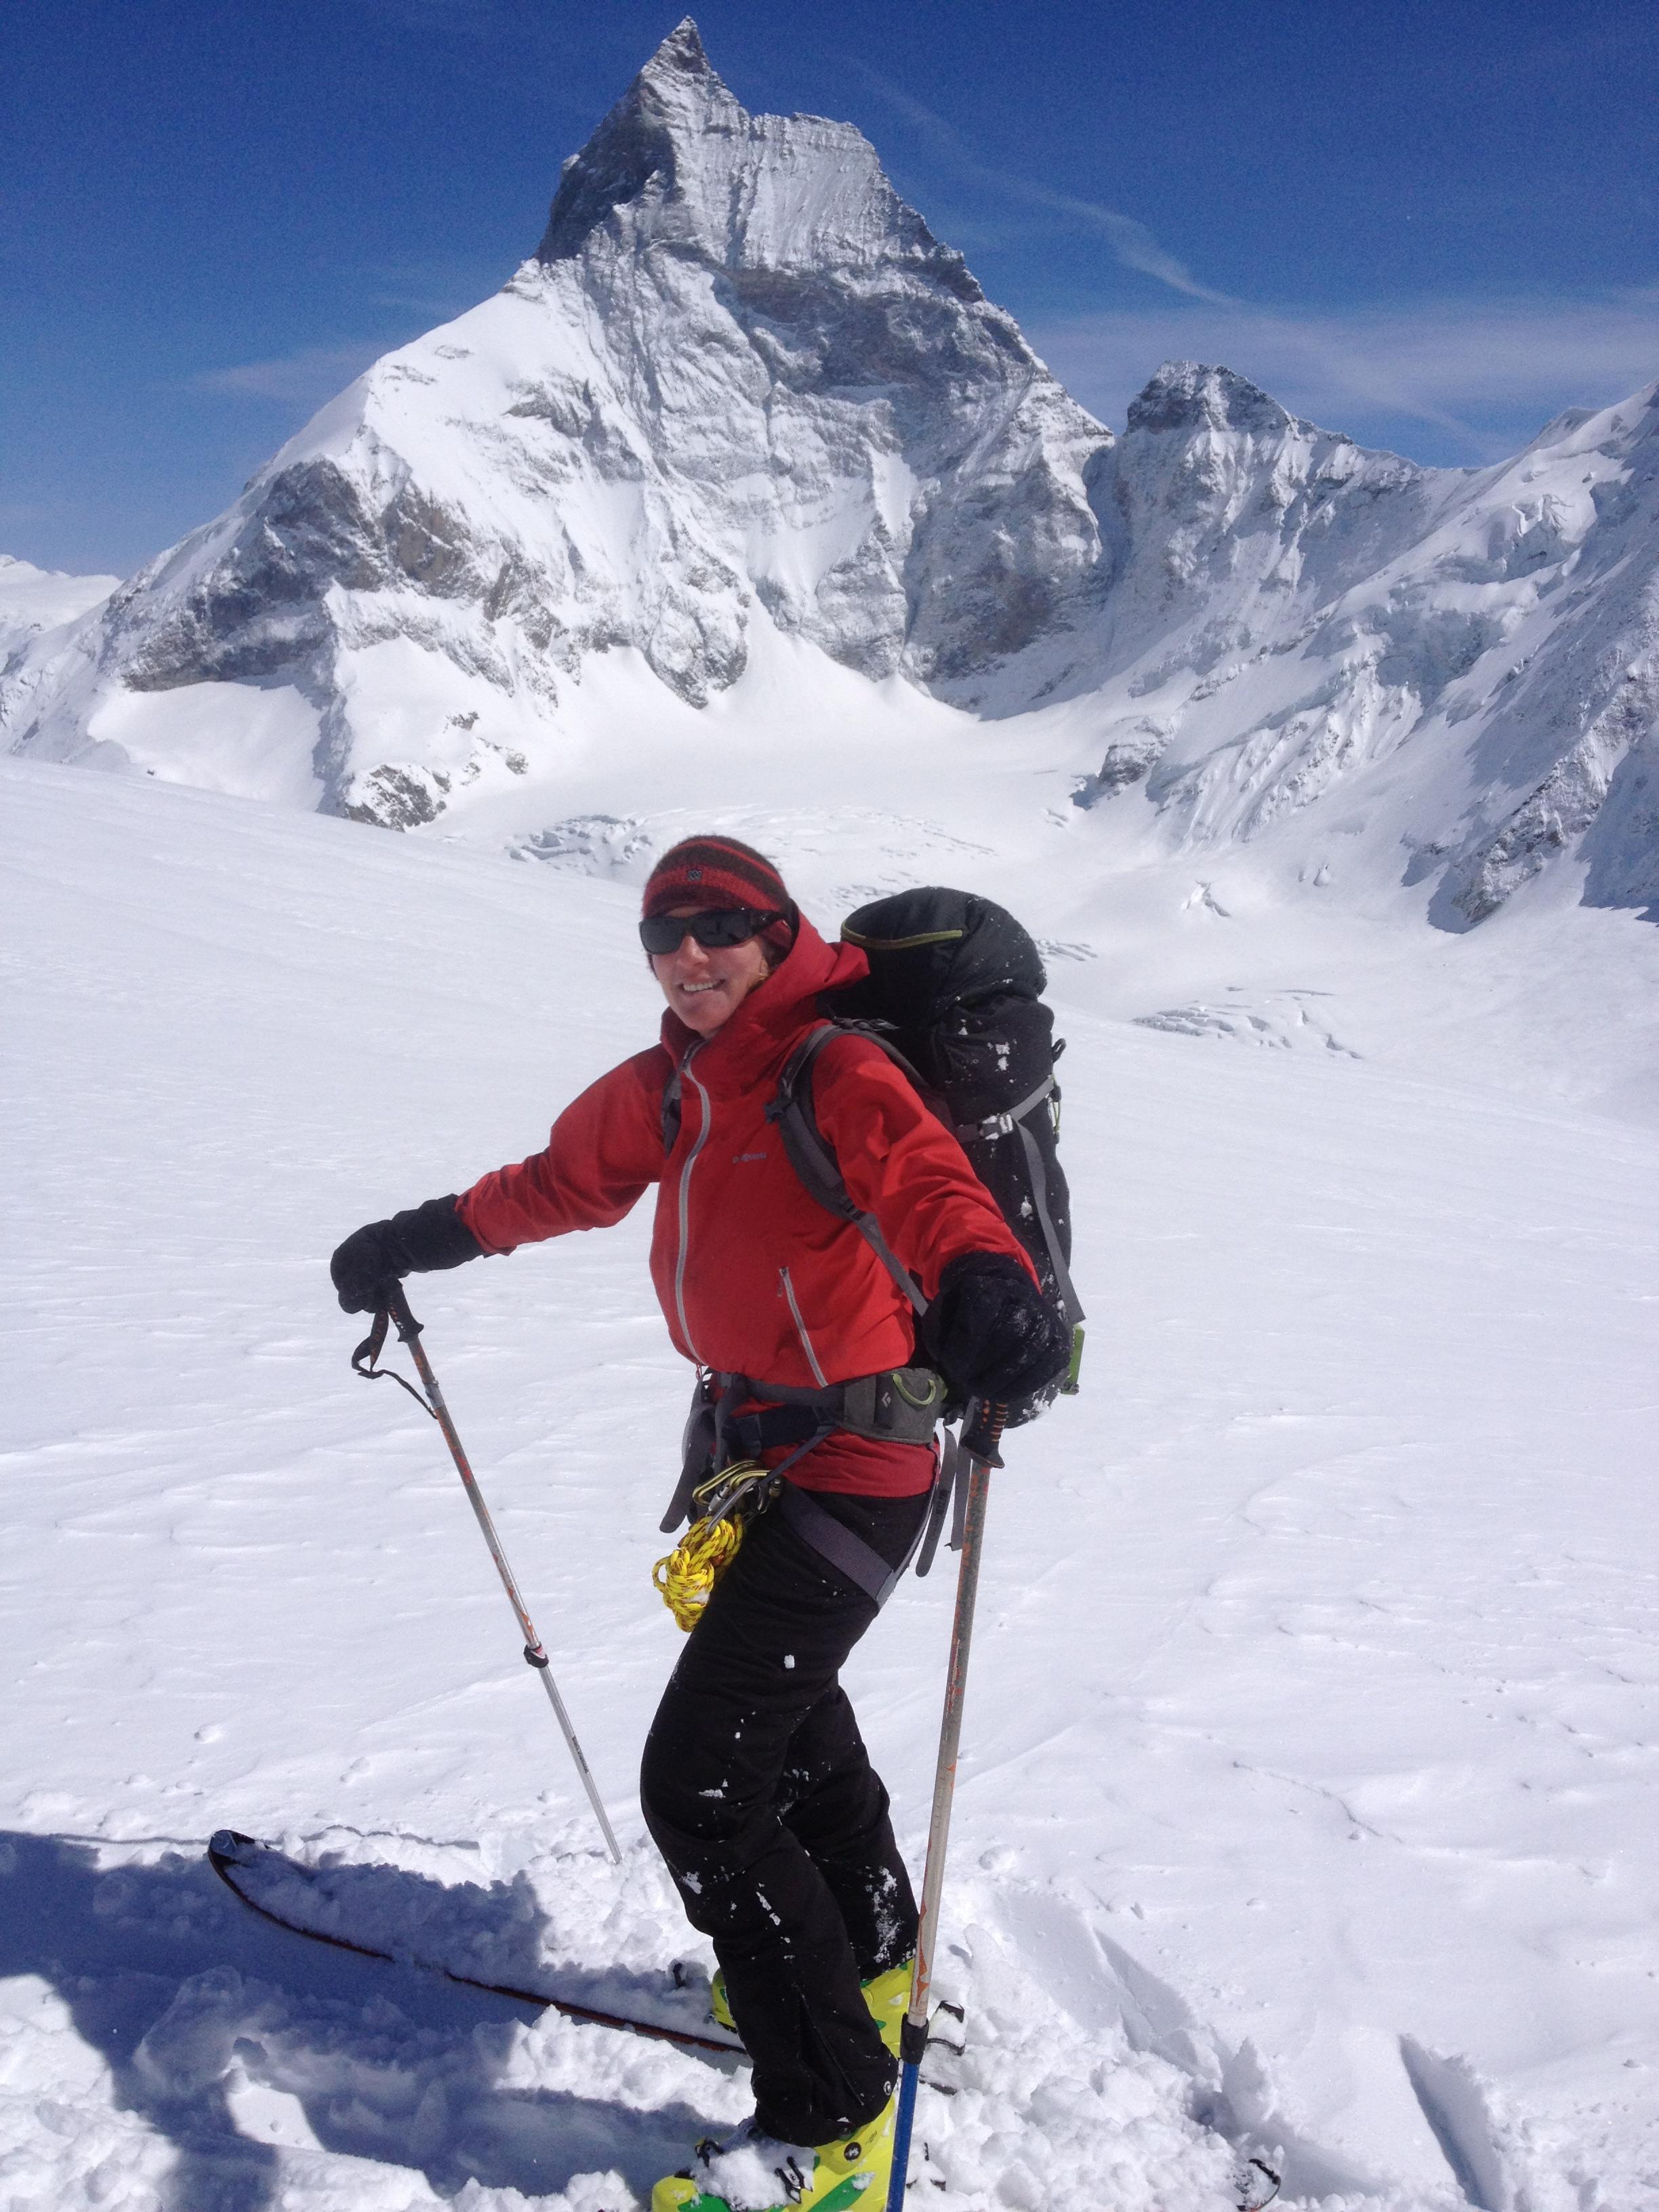 Barbara Matterhorn